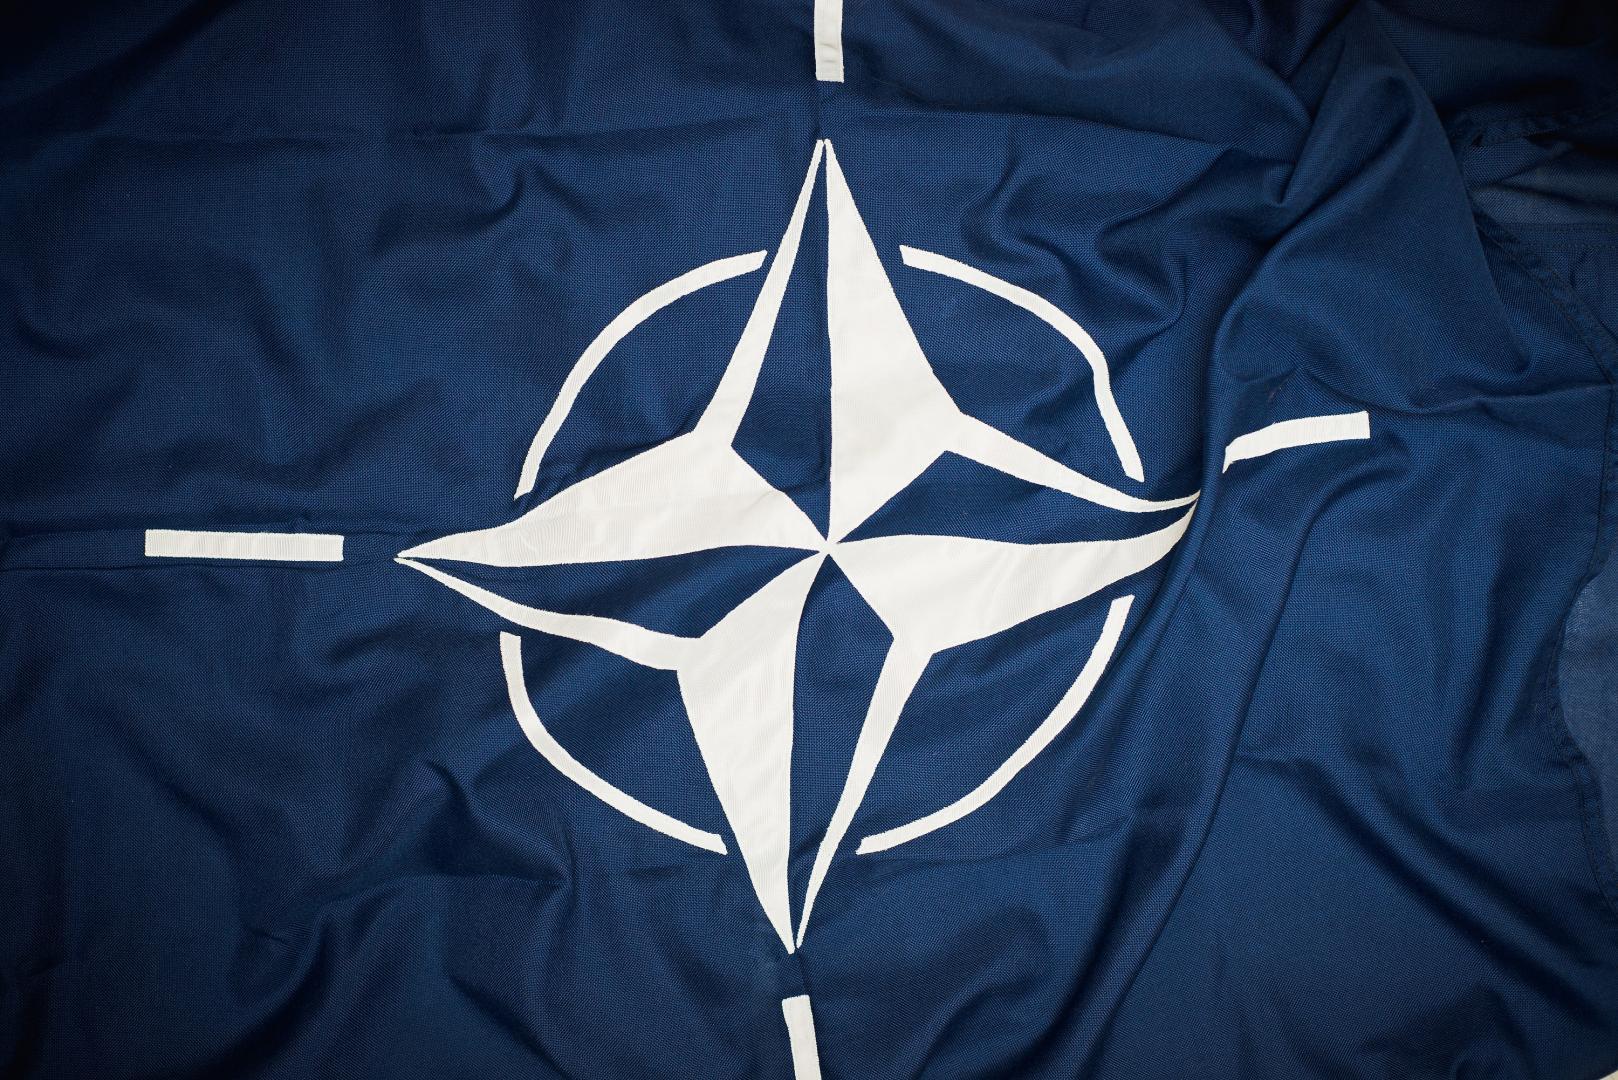 NATO, provocări la Marea Neagră